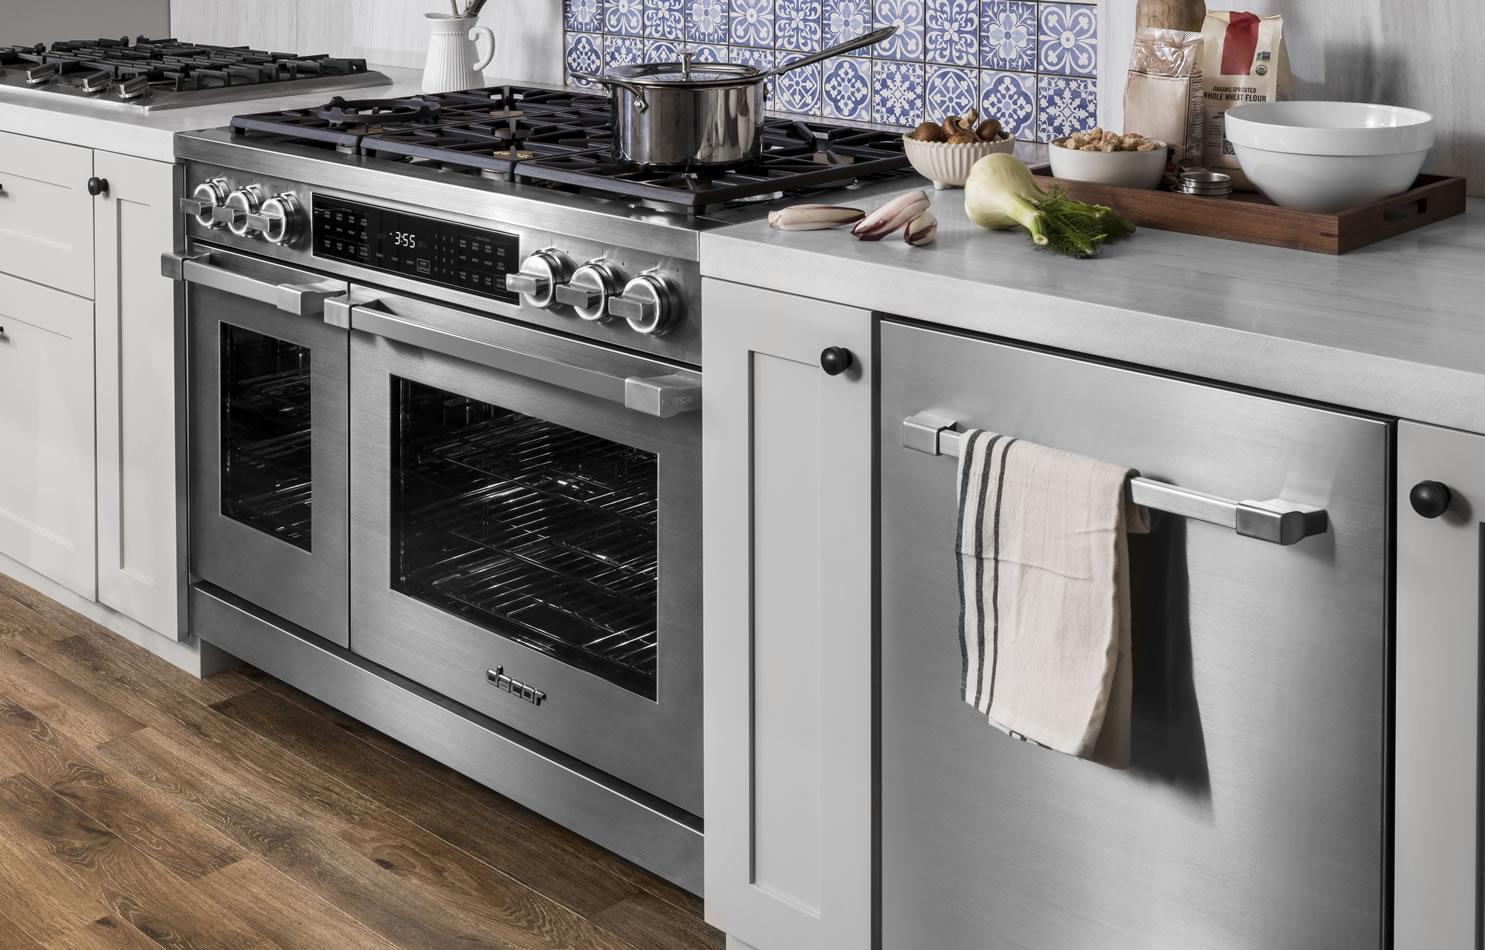 Dacor Ranges Cooking Appliances Arizona Wholesale Supply